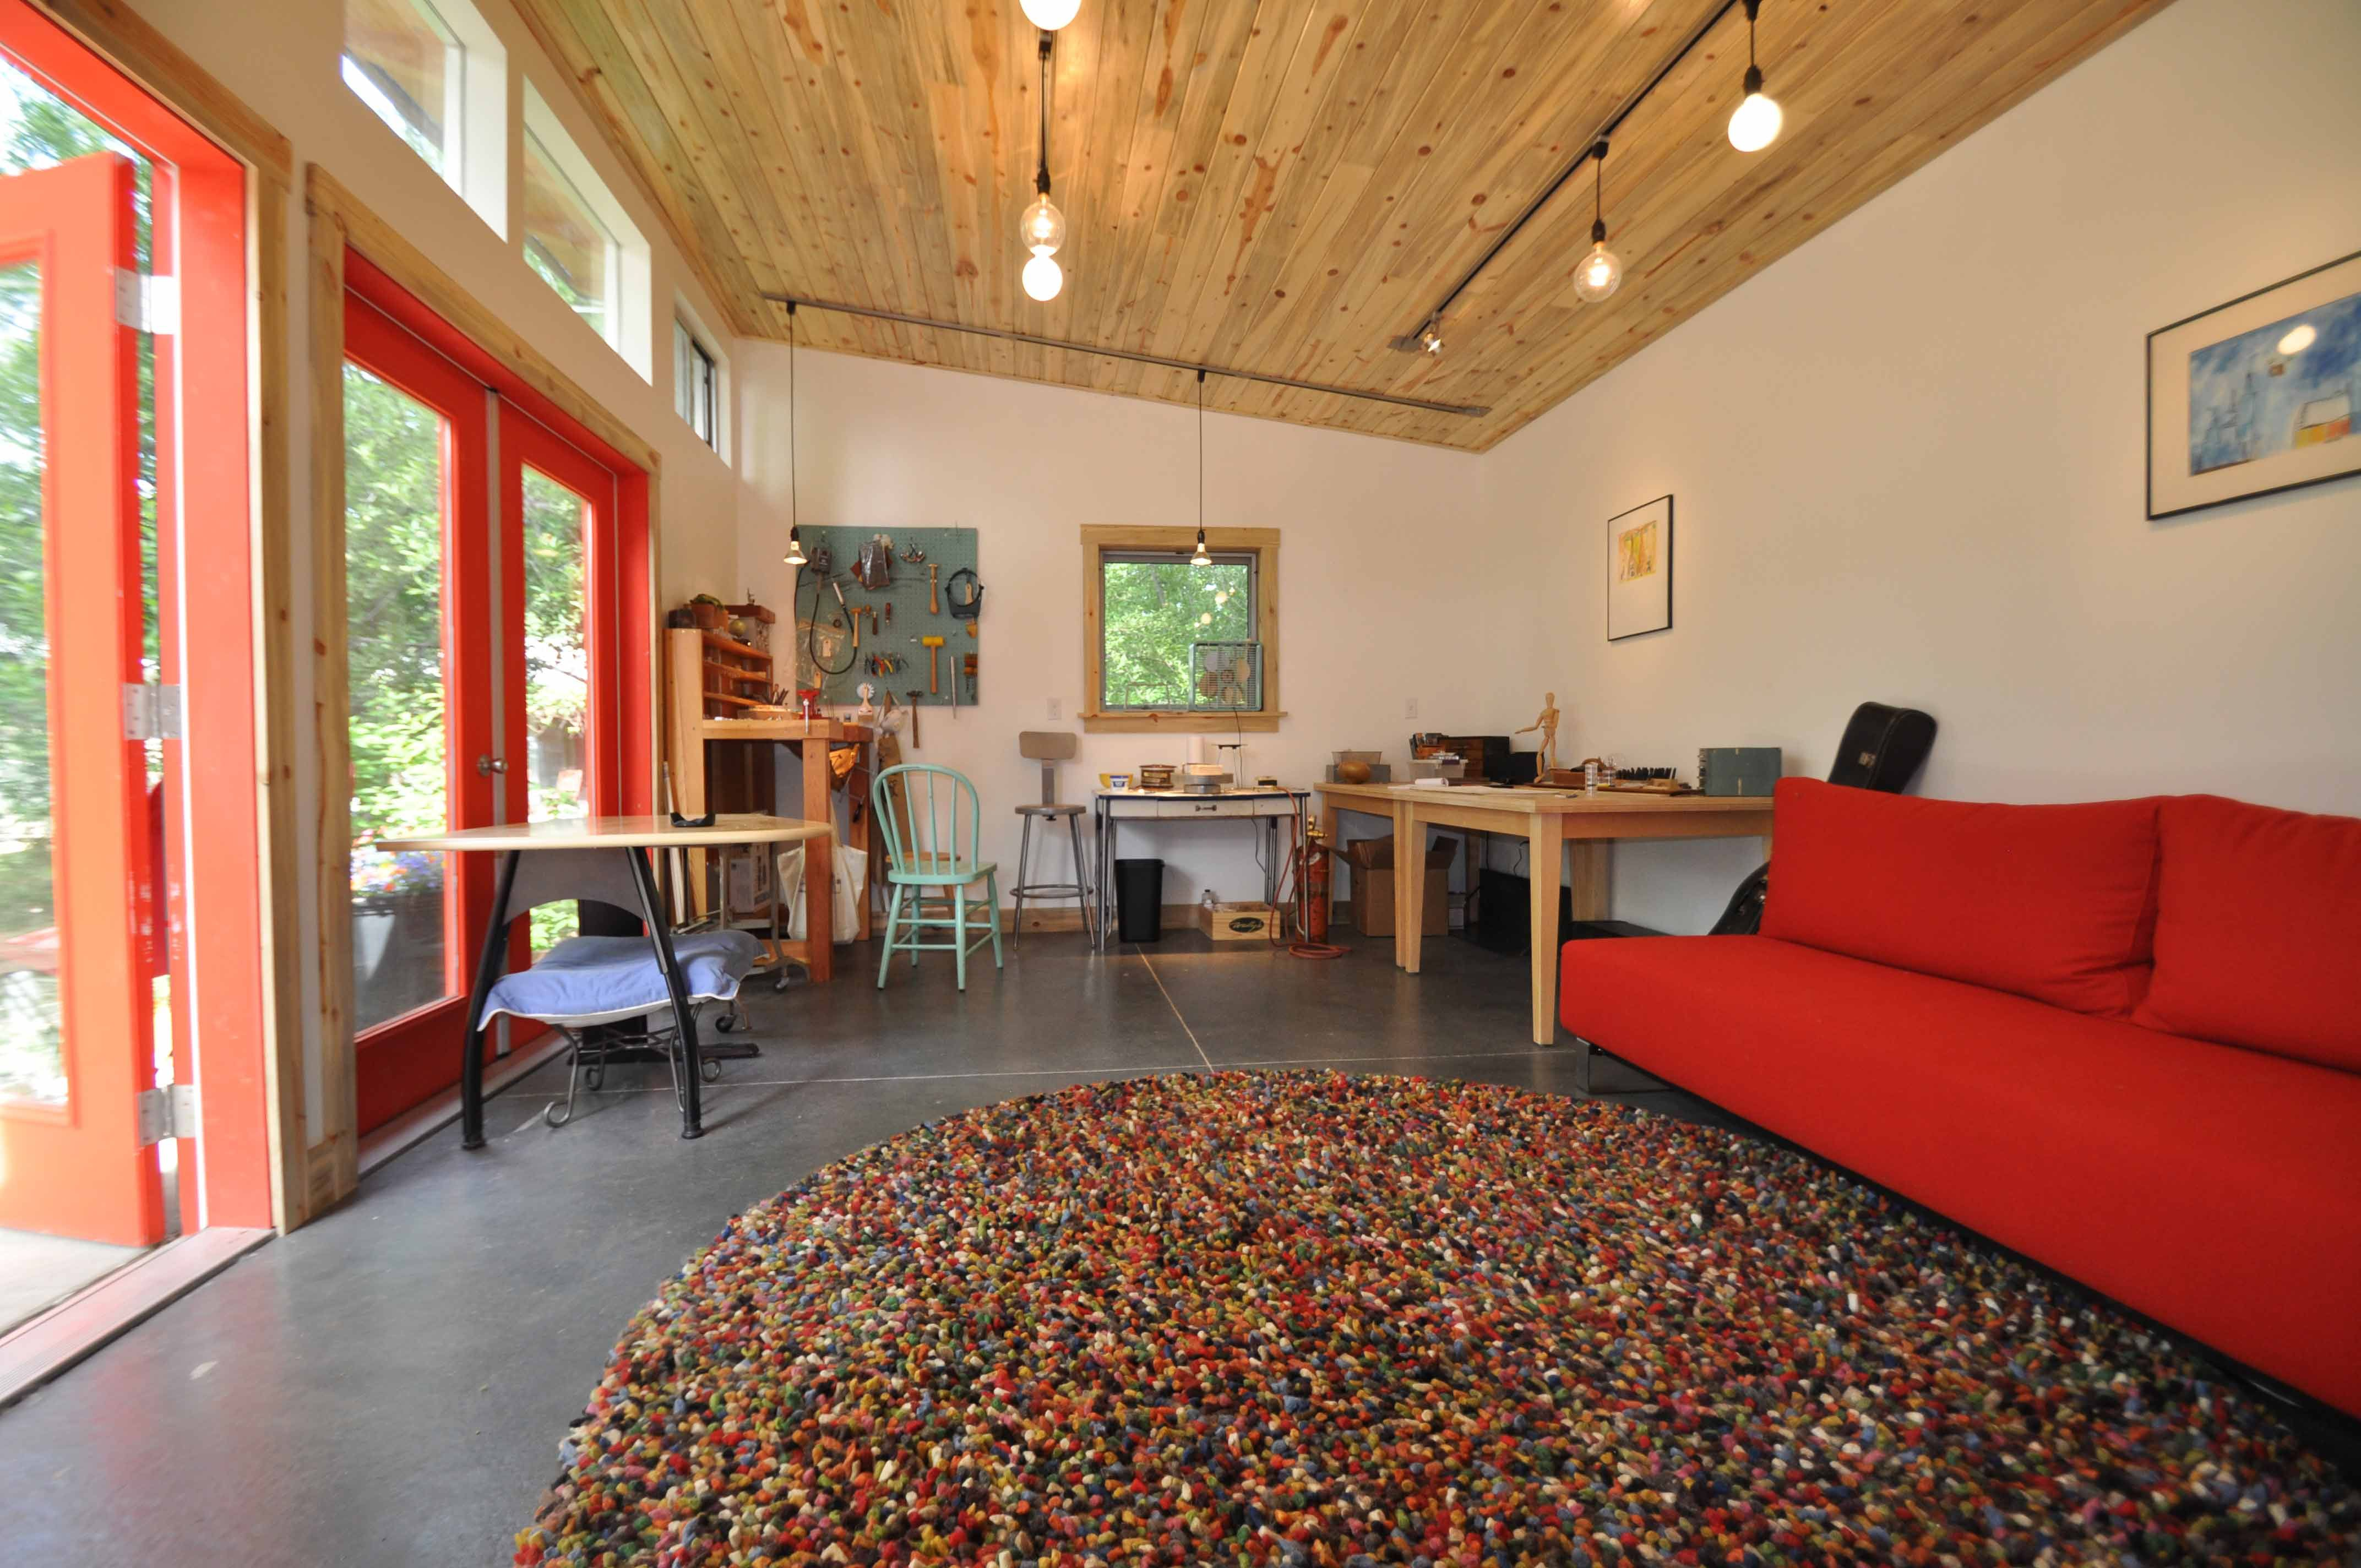 tiny backyard home office. Studio Shed Photos | Modern, Prefab Backyard Studios \u0026 Home Office Sheds Custom Designs Tiny K